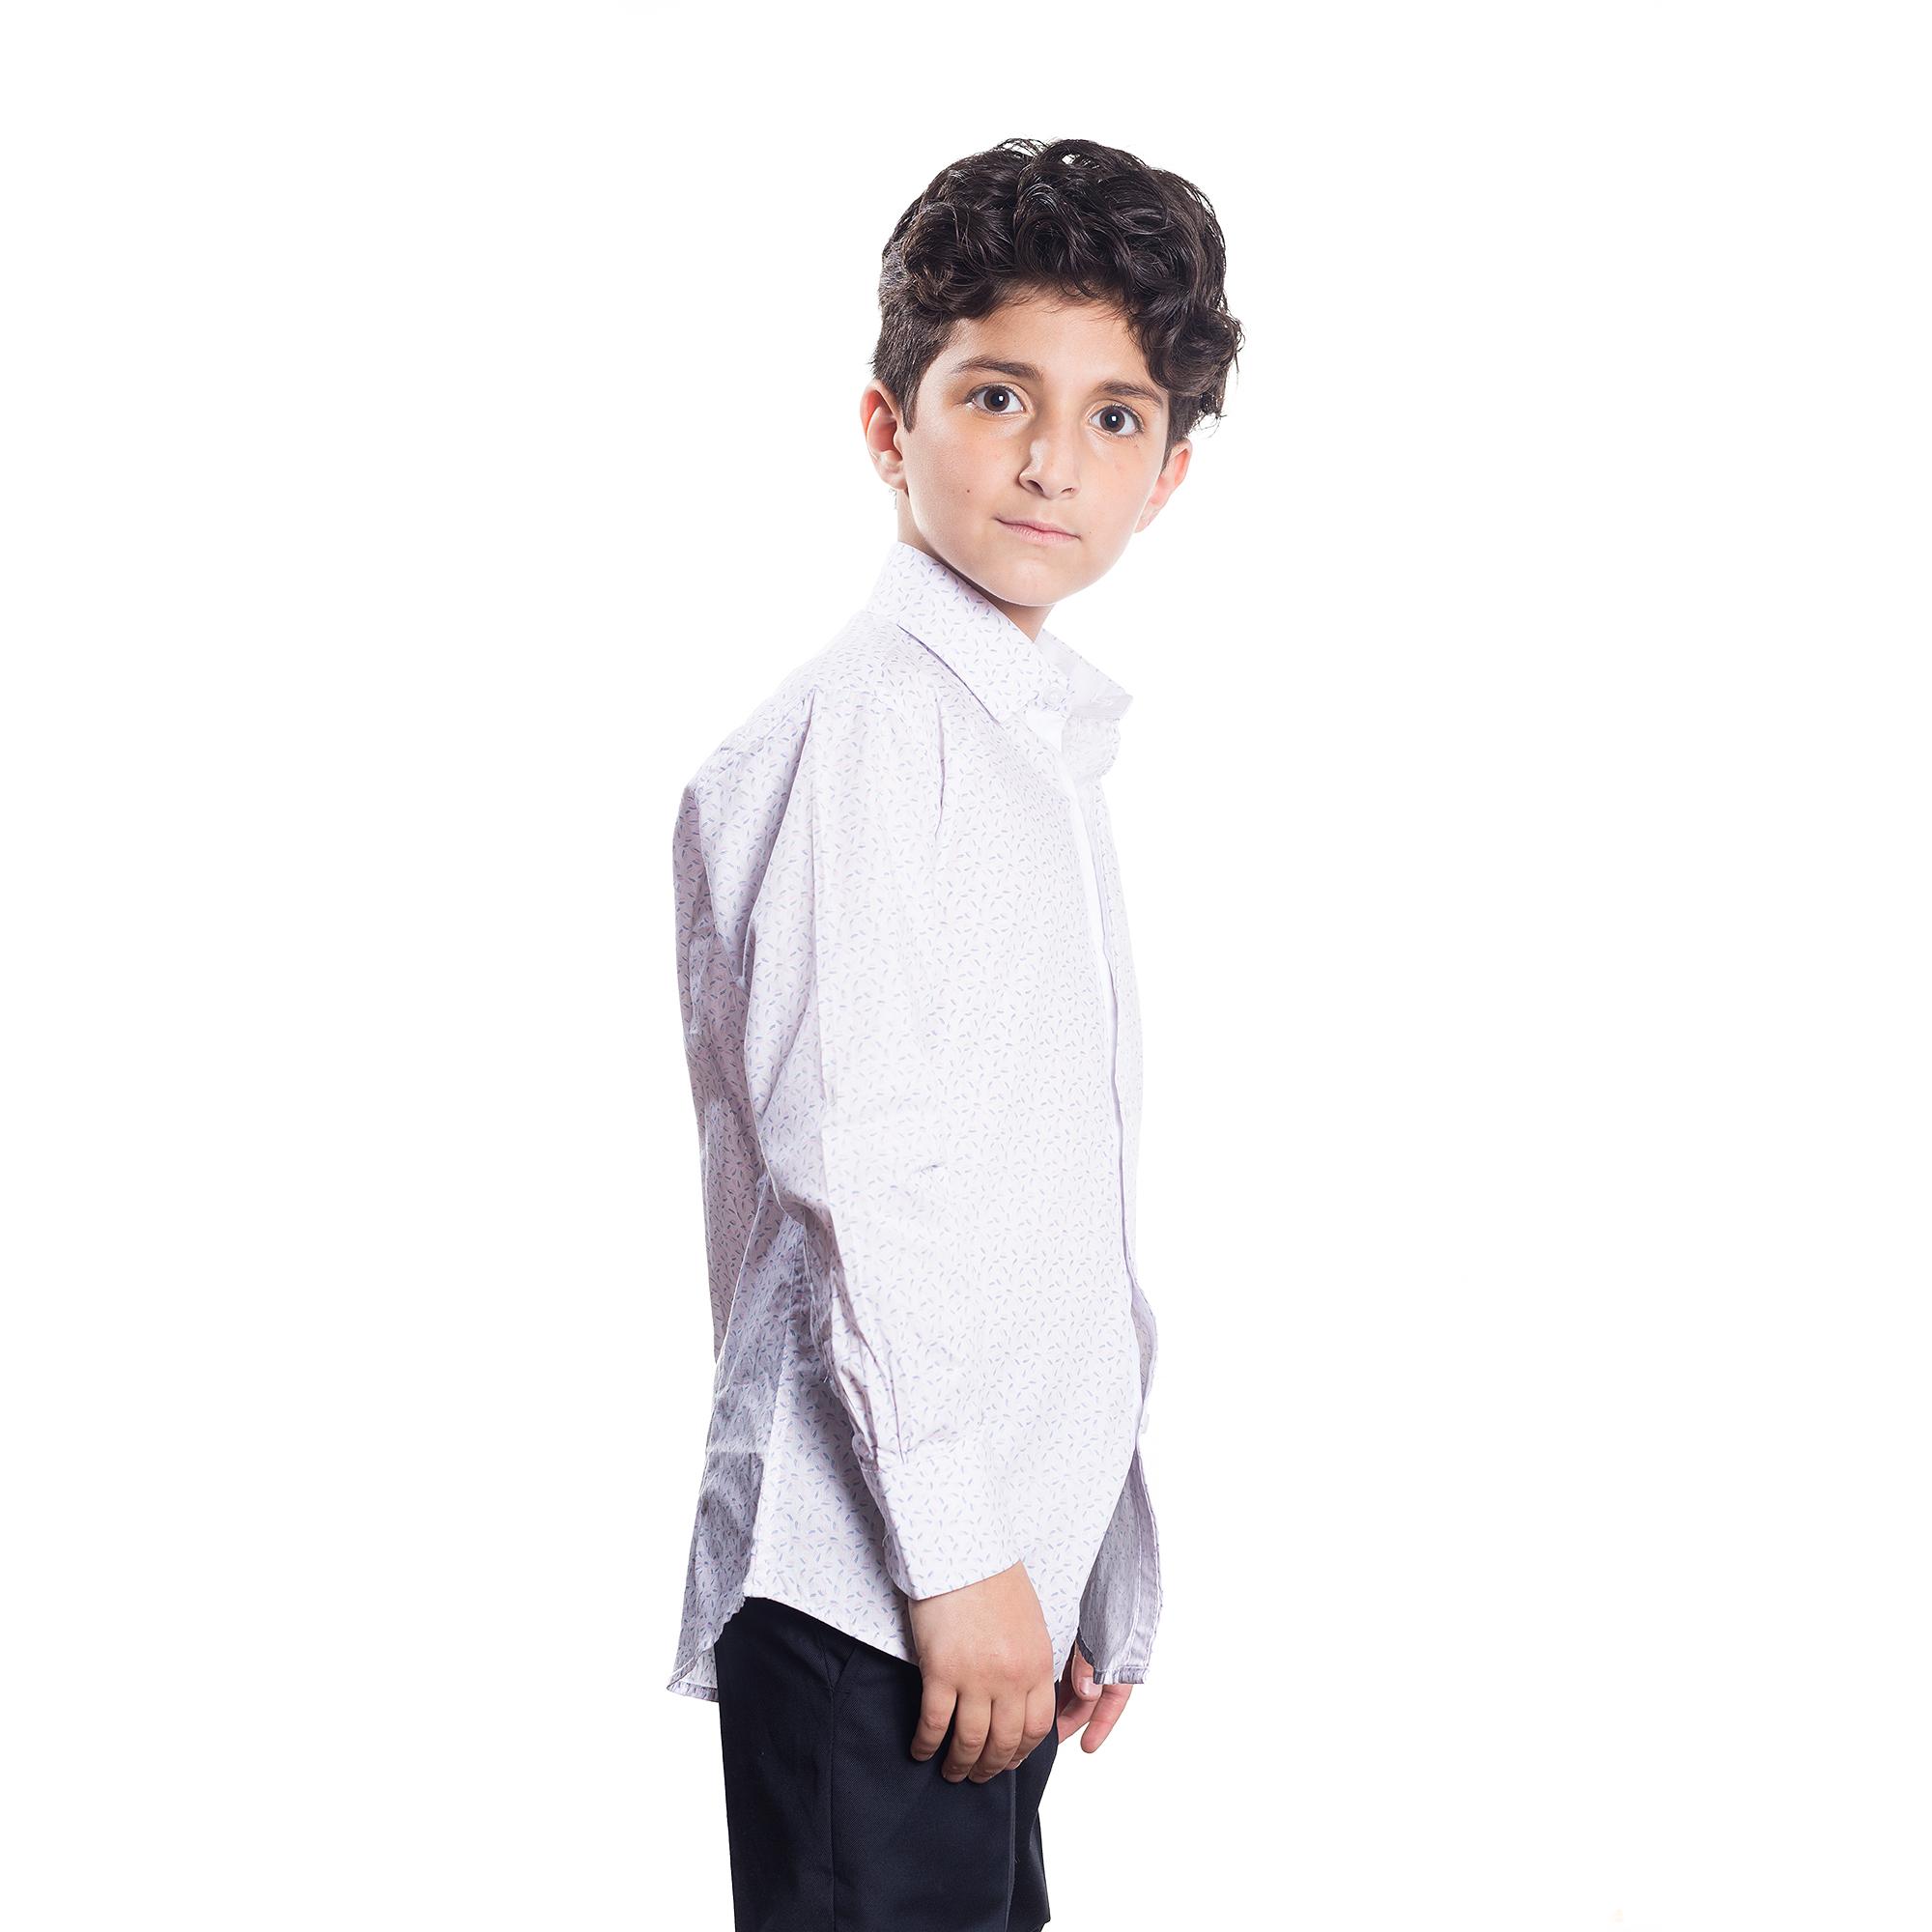 Feather Print Boys Shirts / Button Down EBSH144B